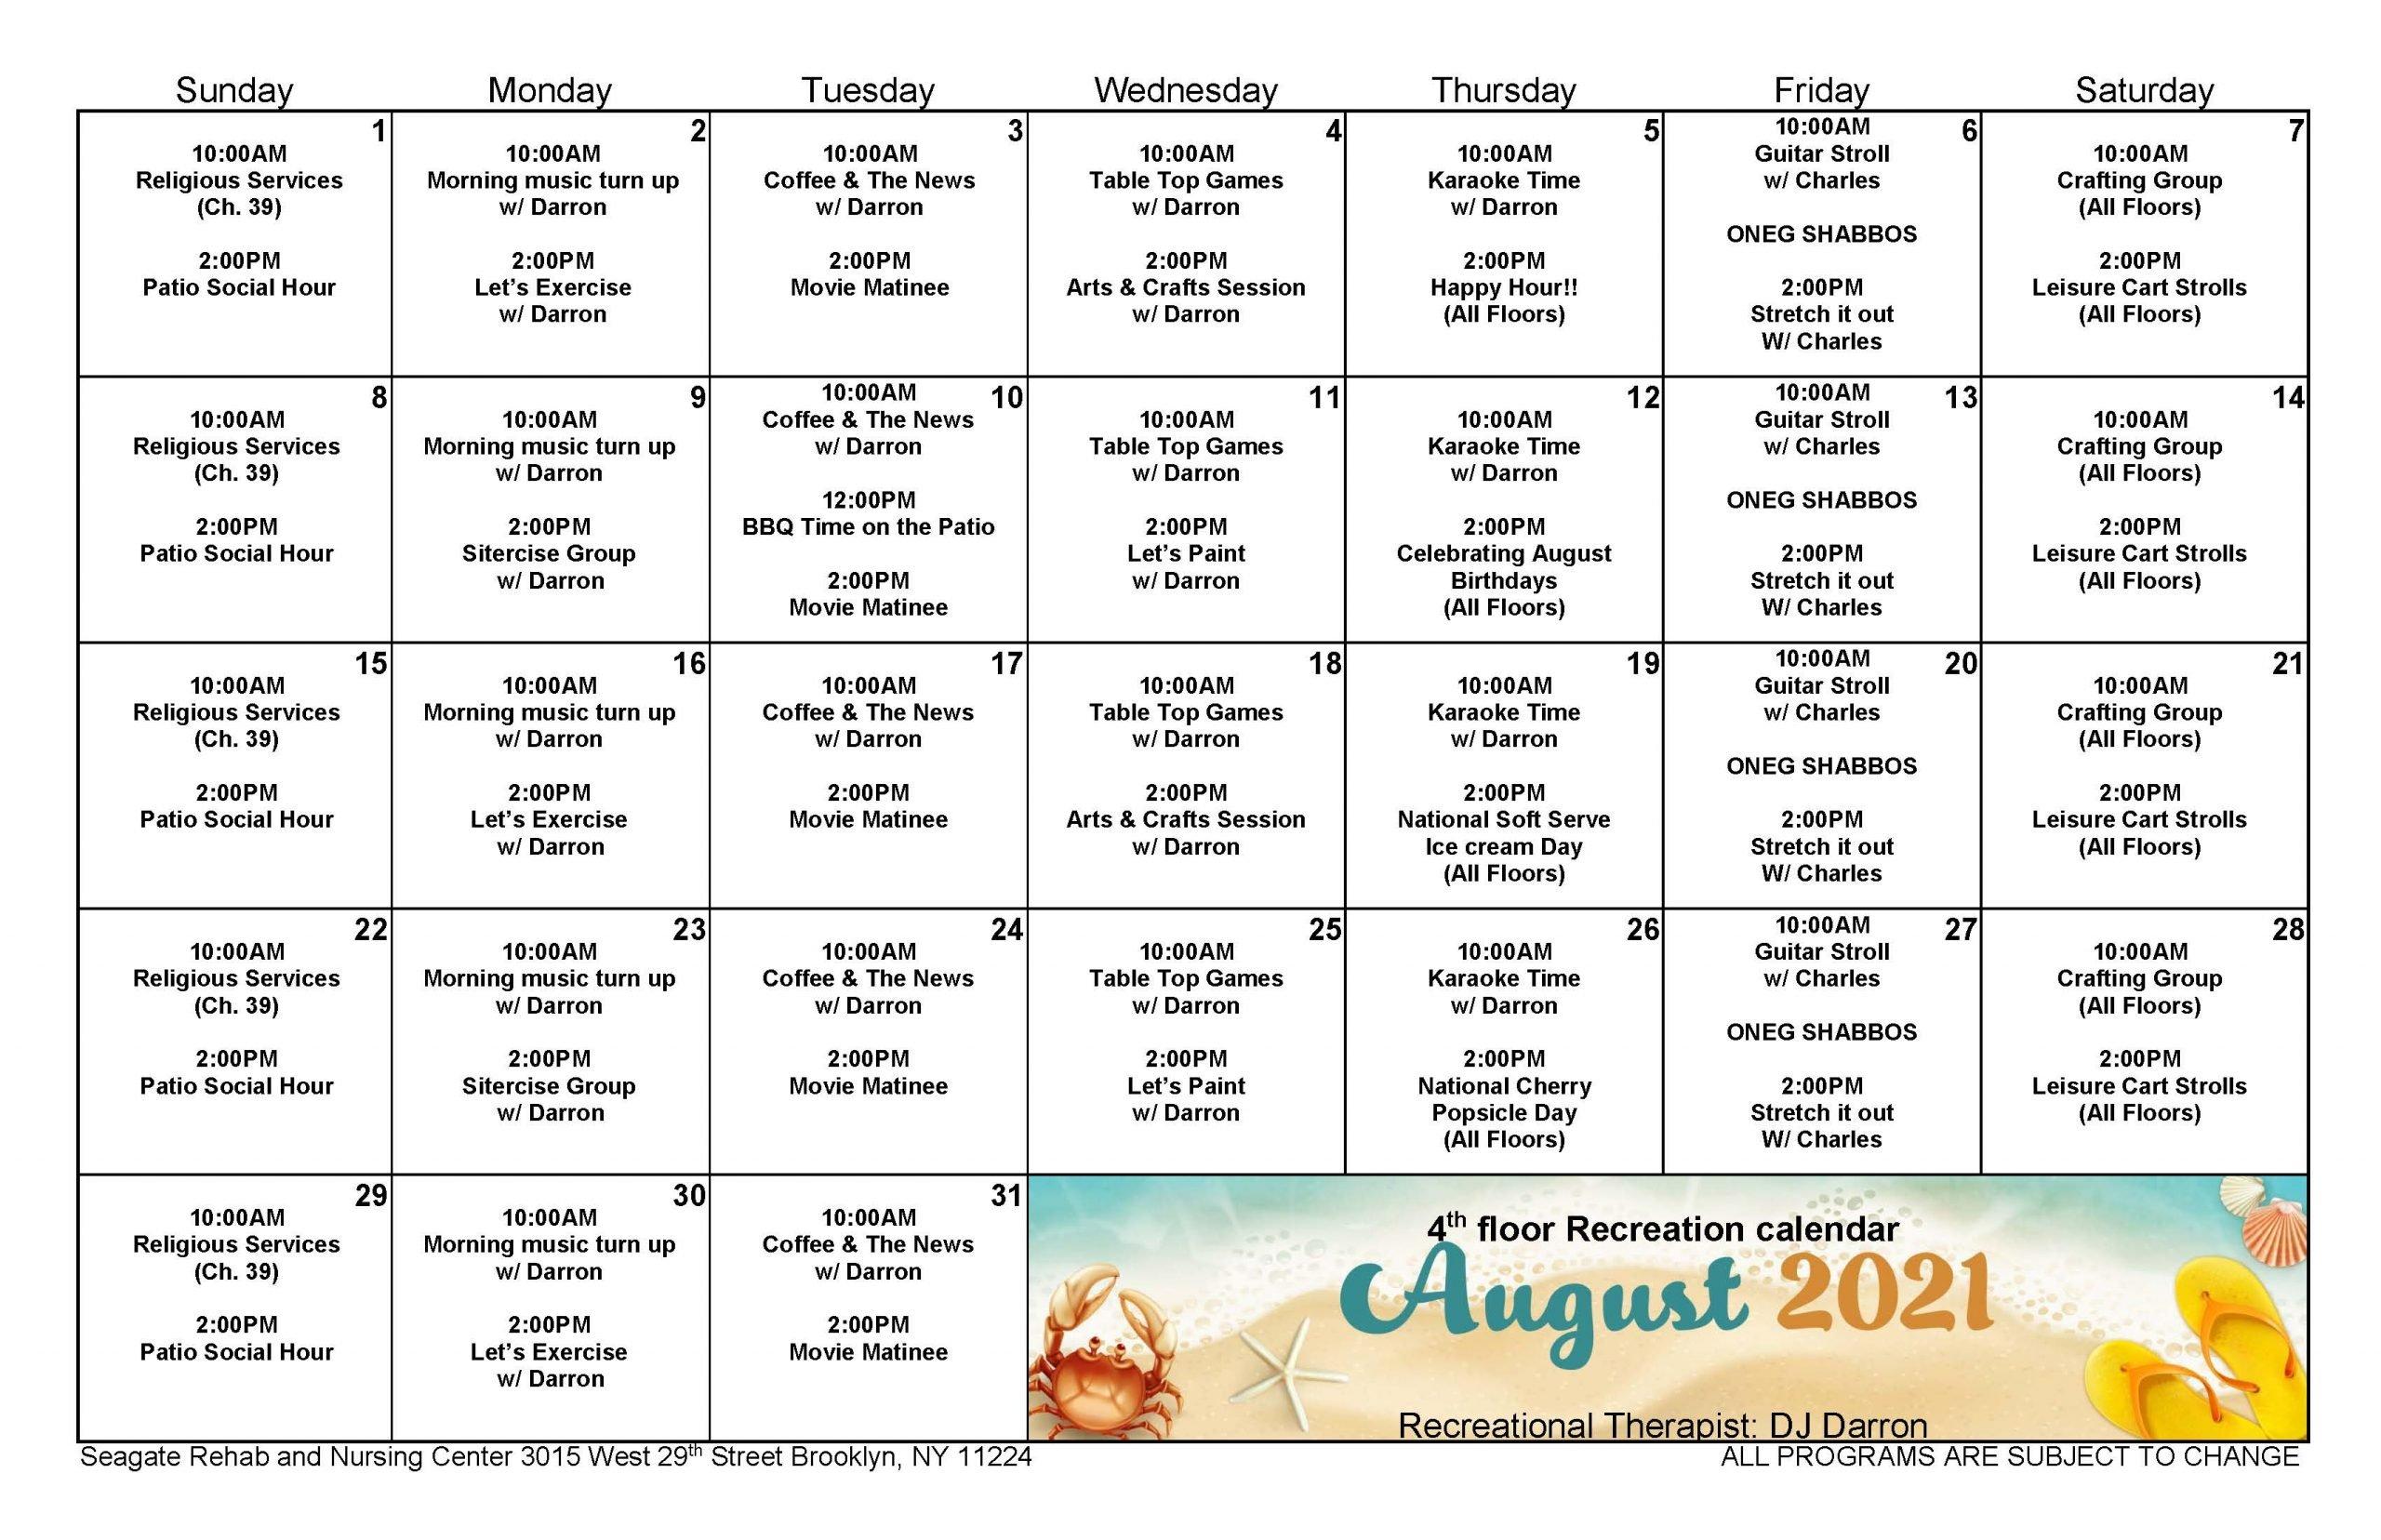 Seagate August Event Calendar for 4th Floor